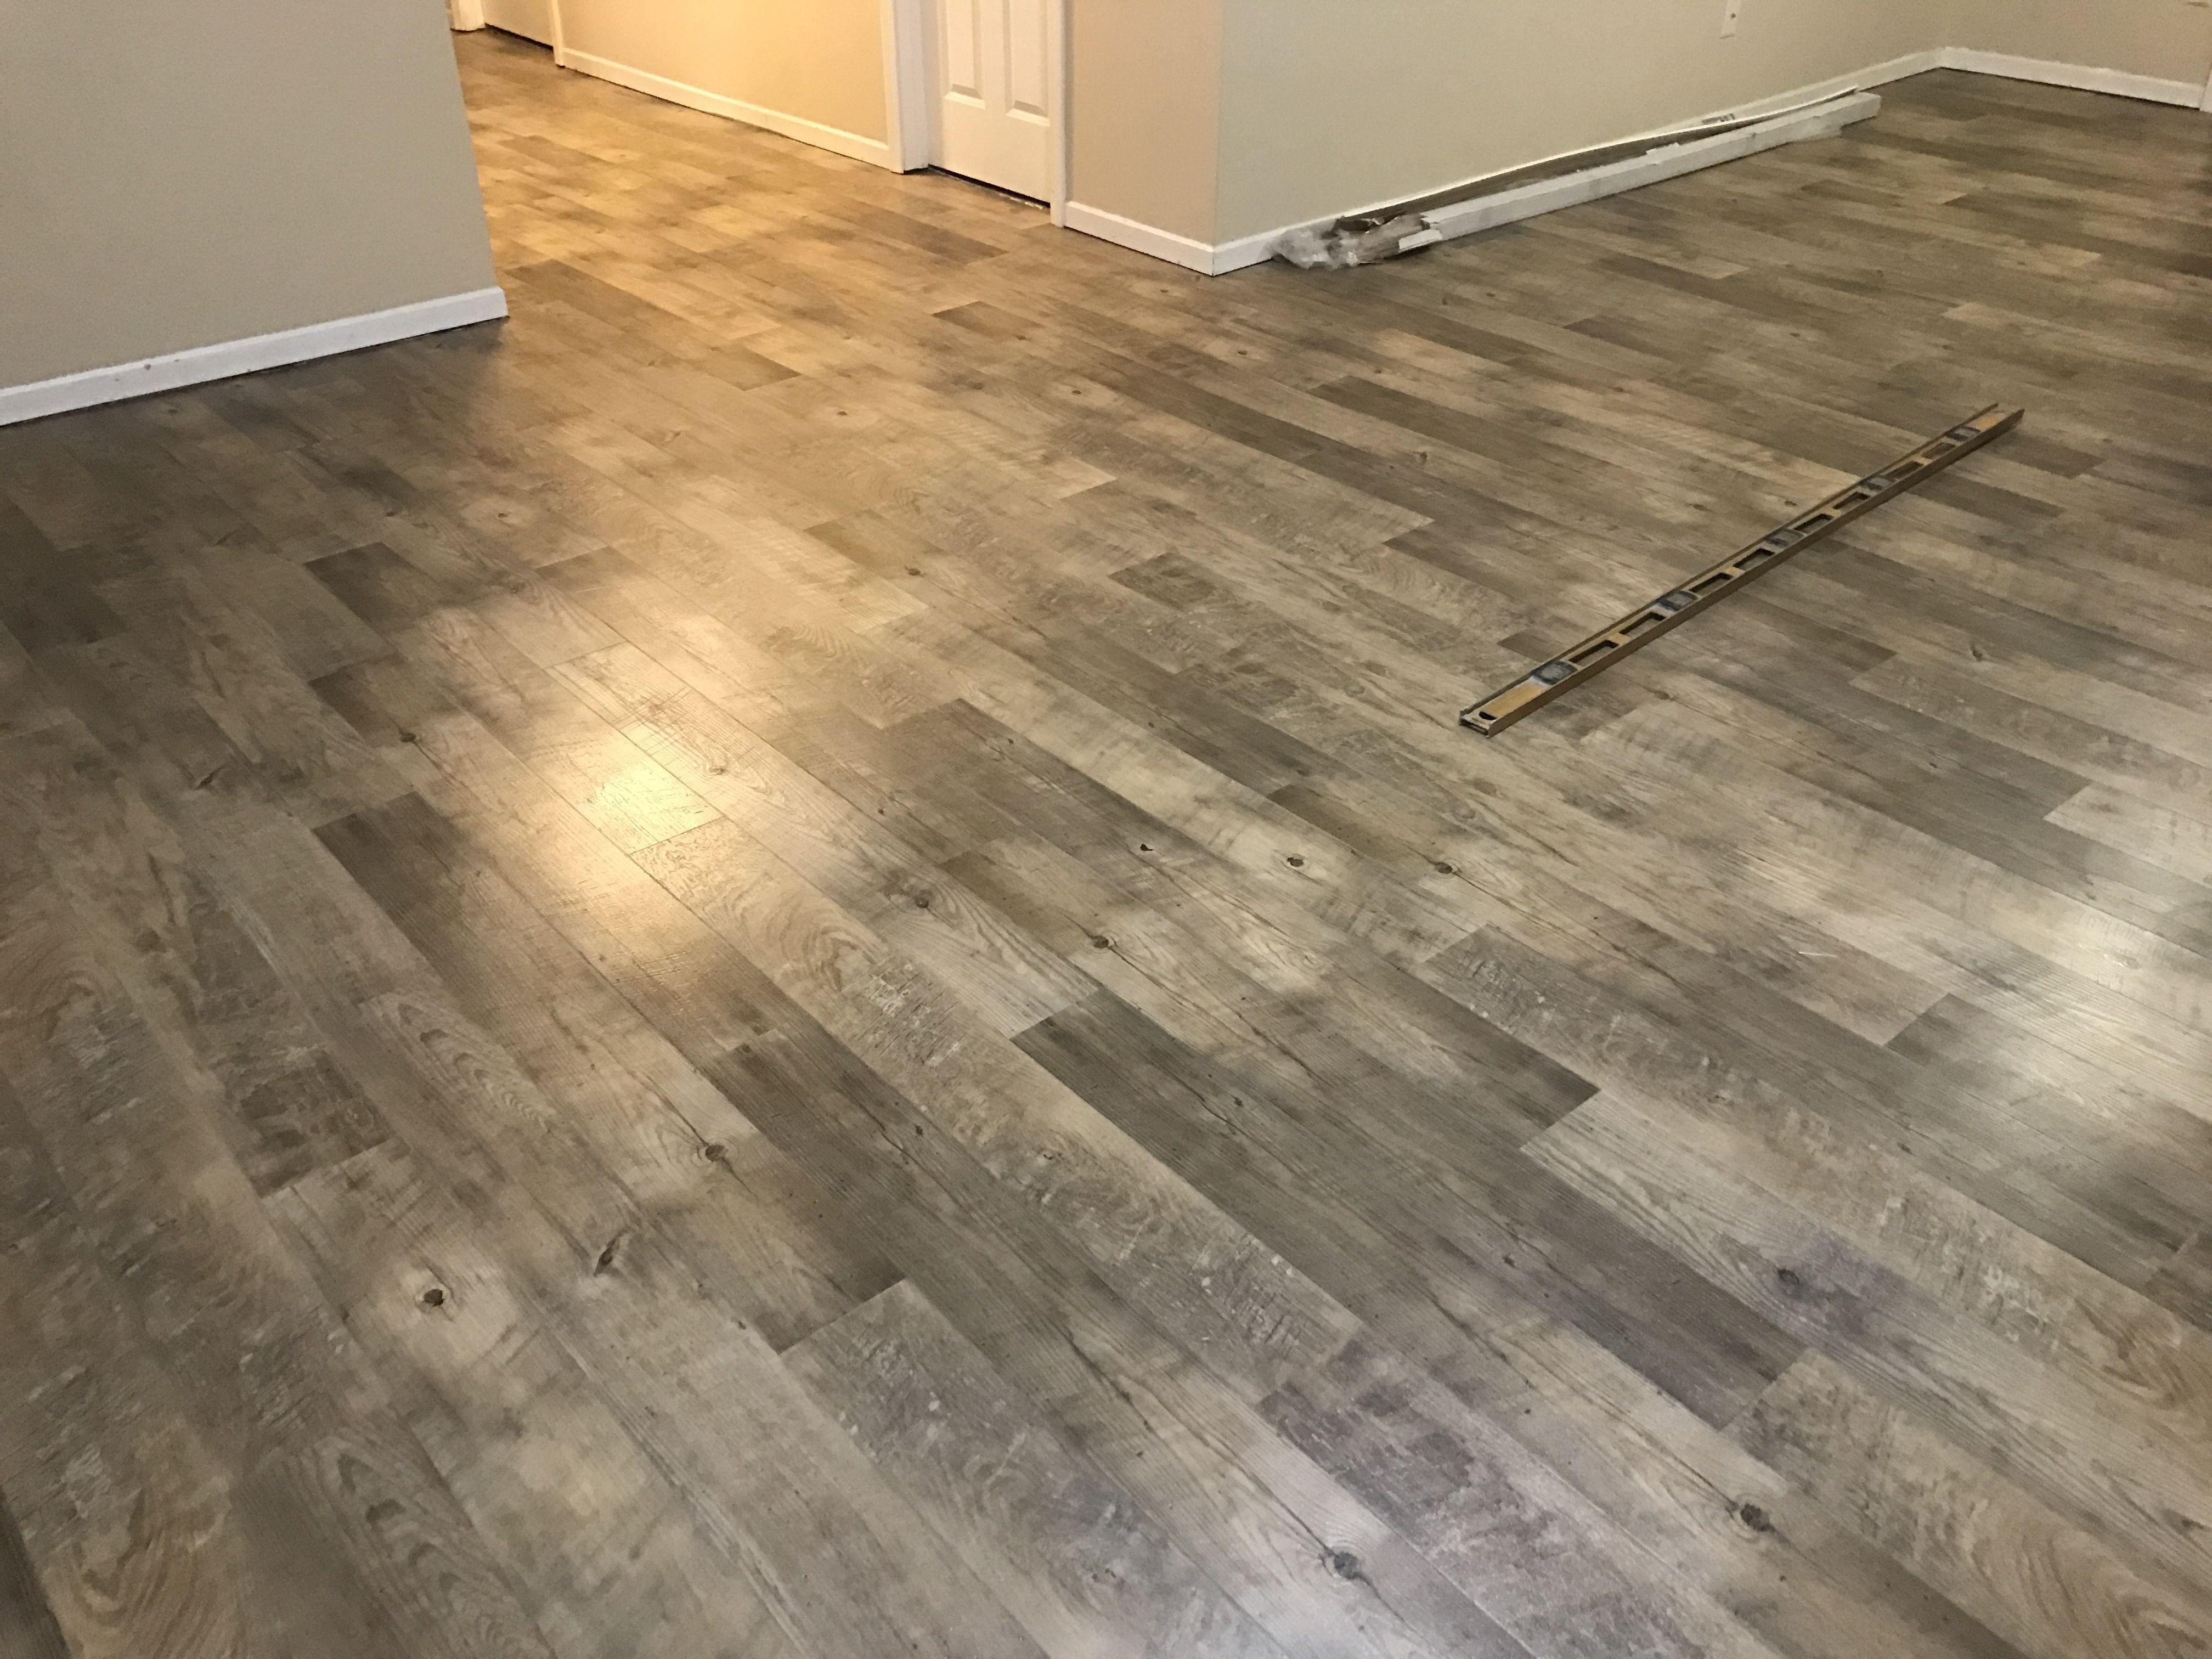 hardwood floor refinishing rock hill sc of weathered pine vinyl floors pinterest luxury vinyl plank regarding dockside sand mannington adura luxury vinyl plank glue down in basement